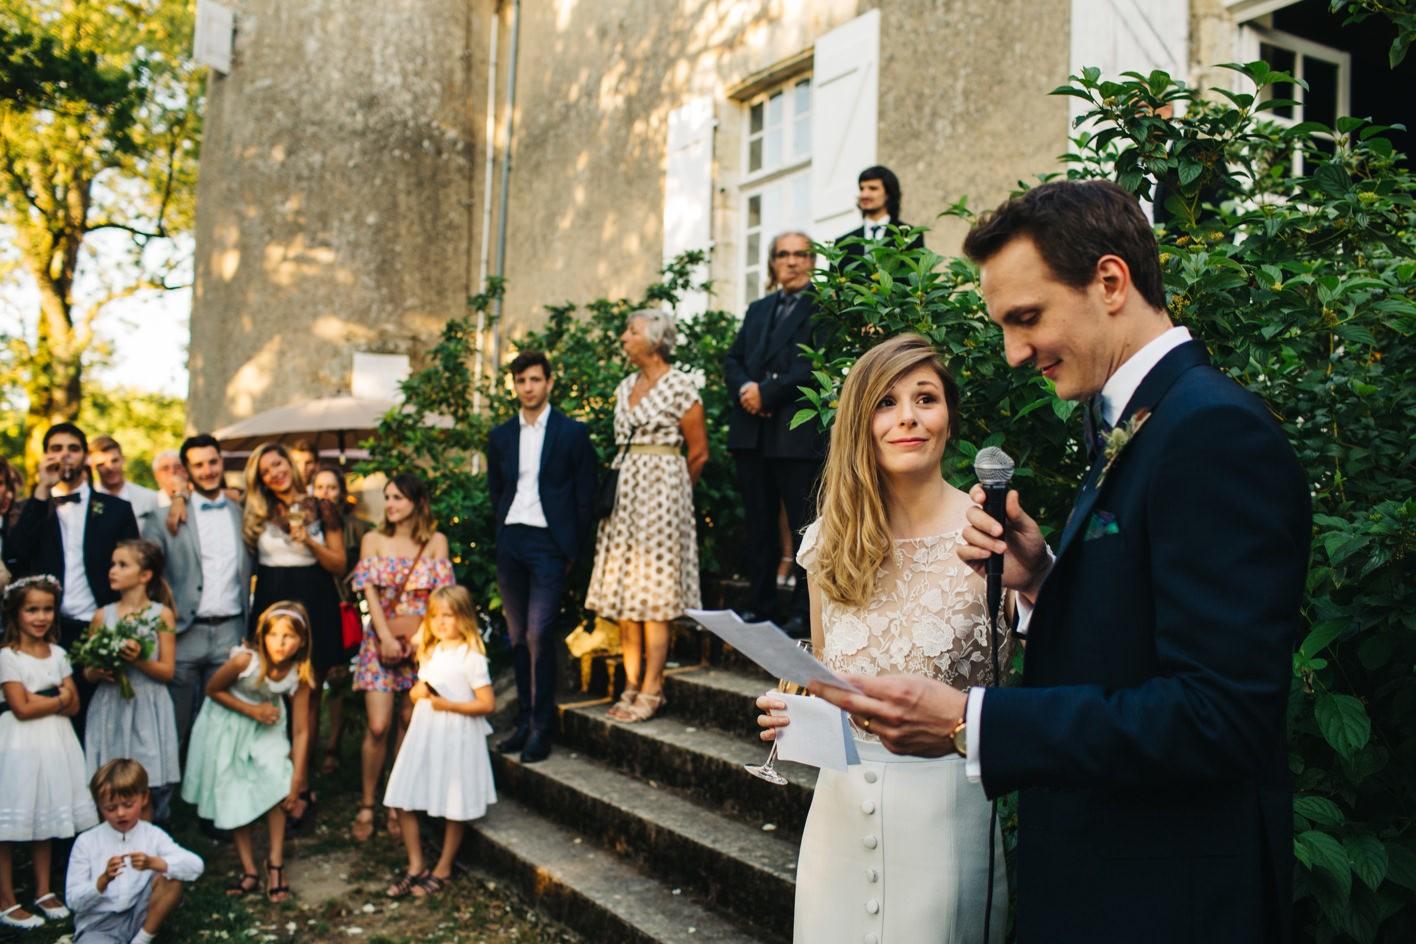 Chateau de lartigolle wedding near toulouse 090